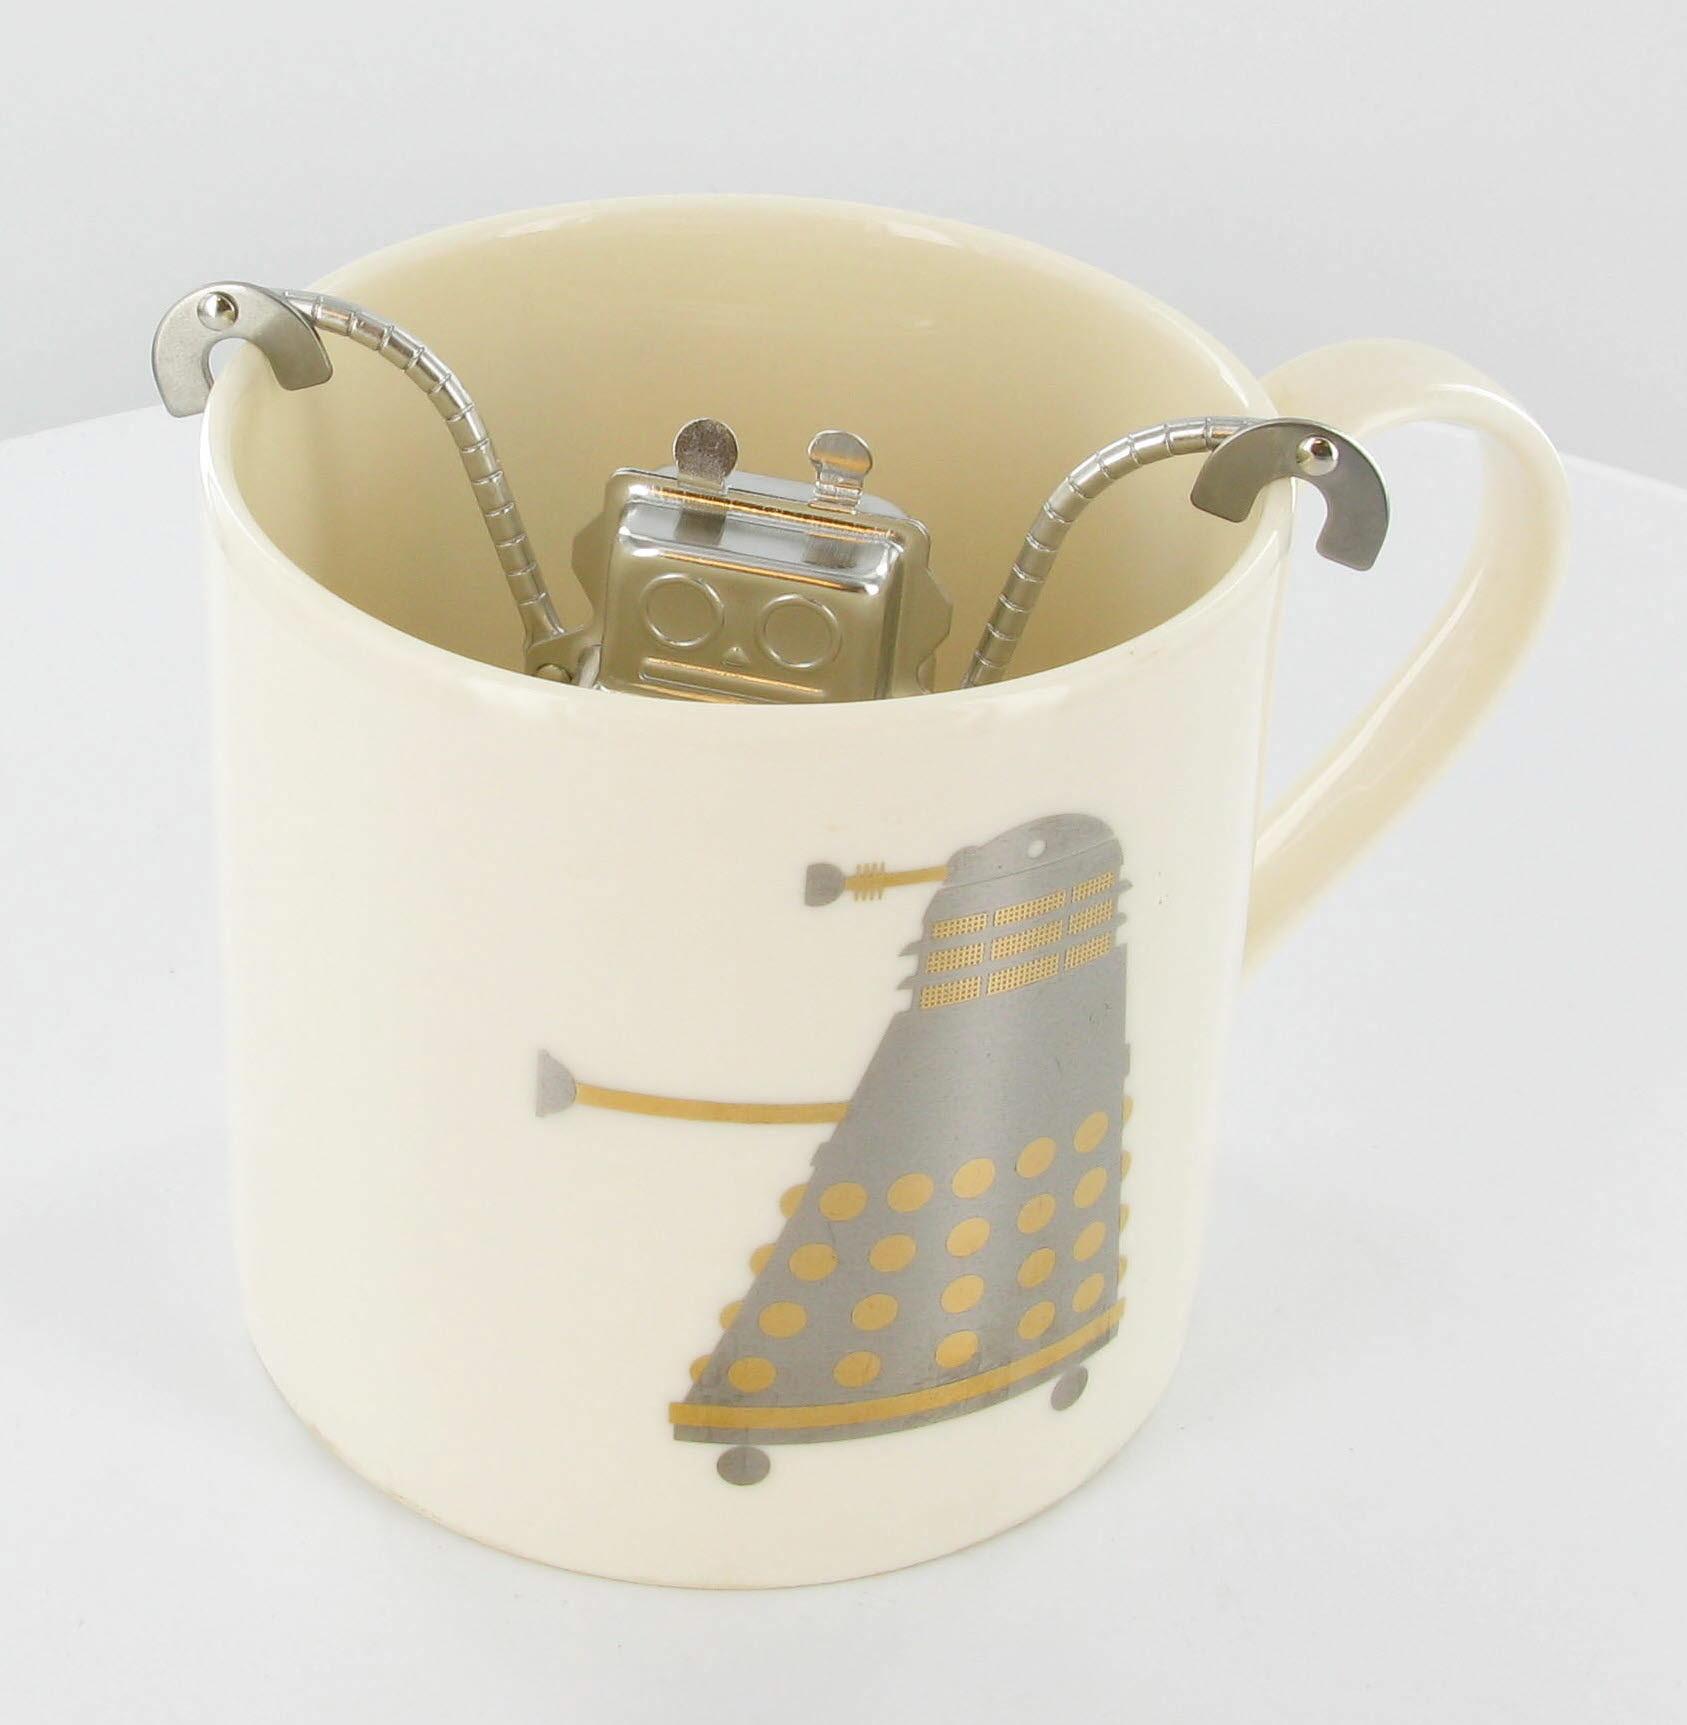 Tee Roboter – Der Ritualshelfer